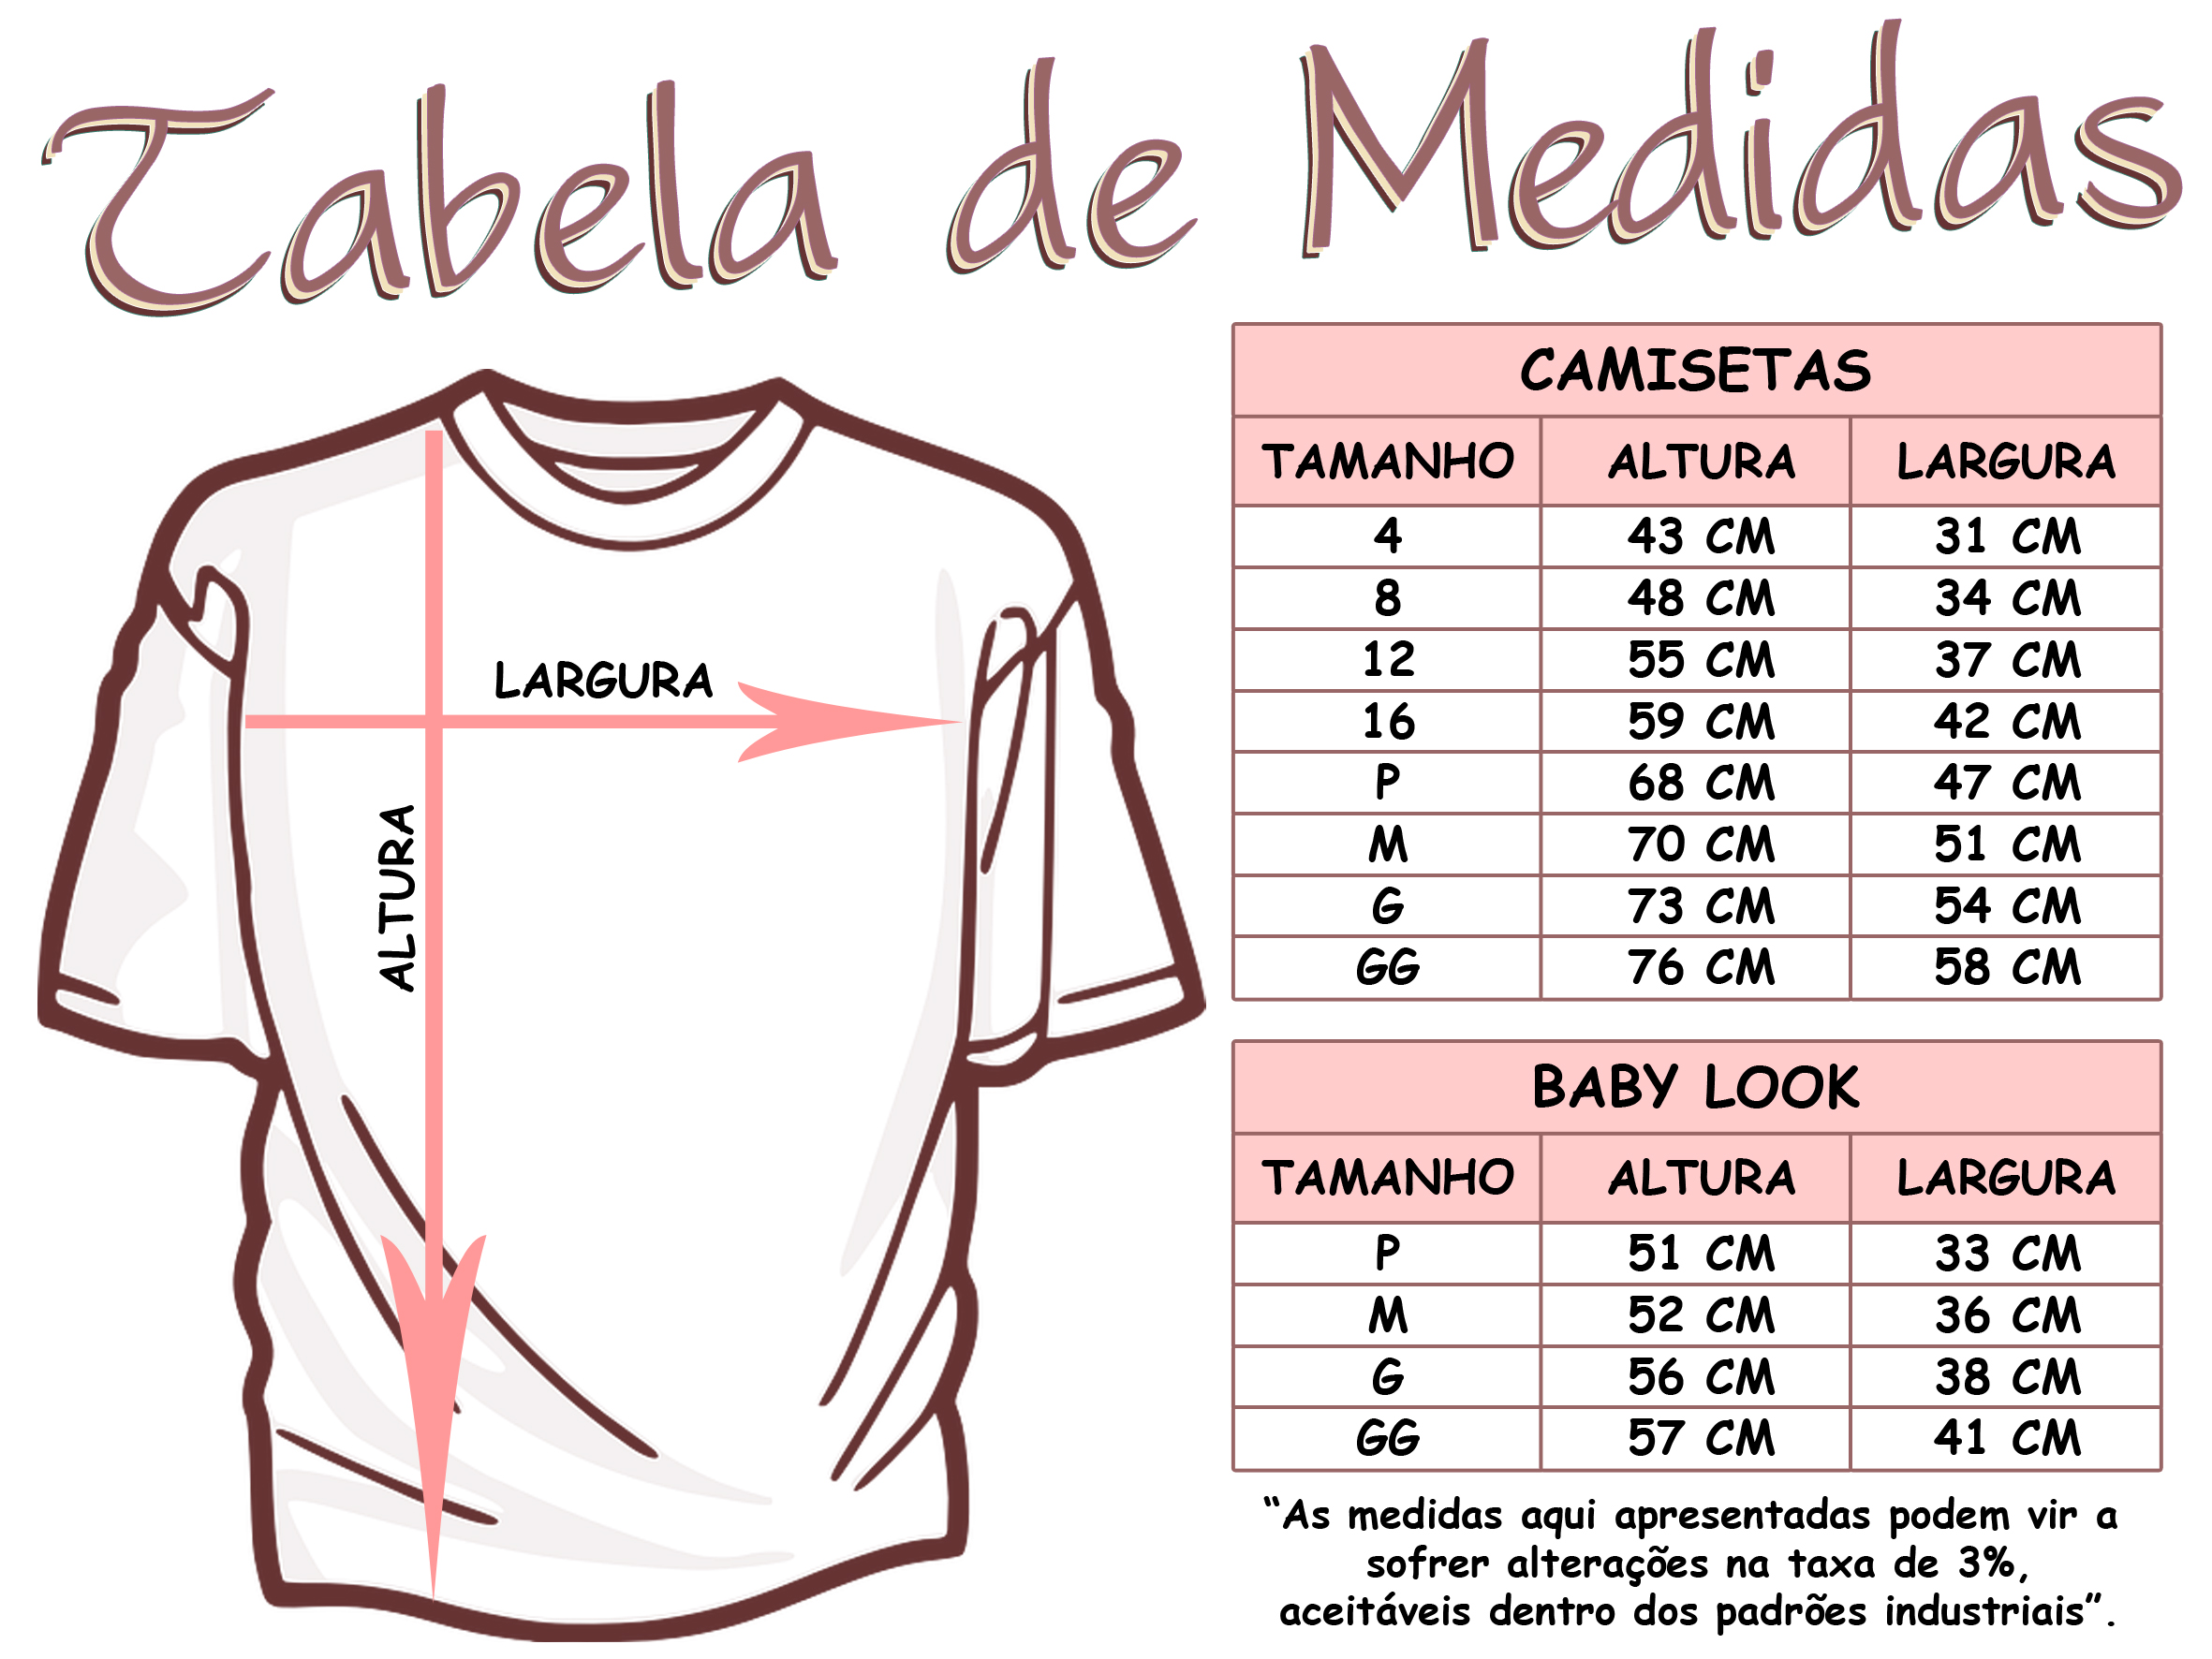 84db8afeaa3262 Camiseta Branca Personalizada M! no Elo7 | S3 Art Design (3999A1)